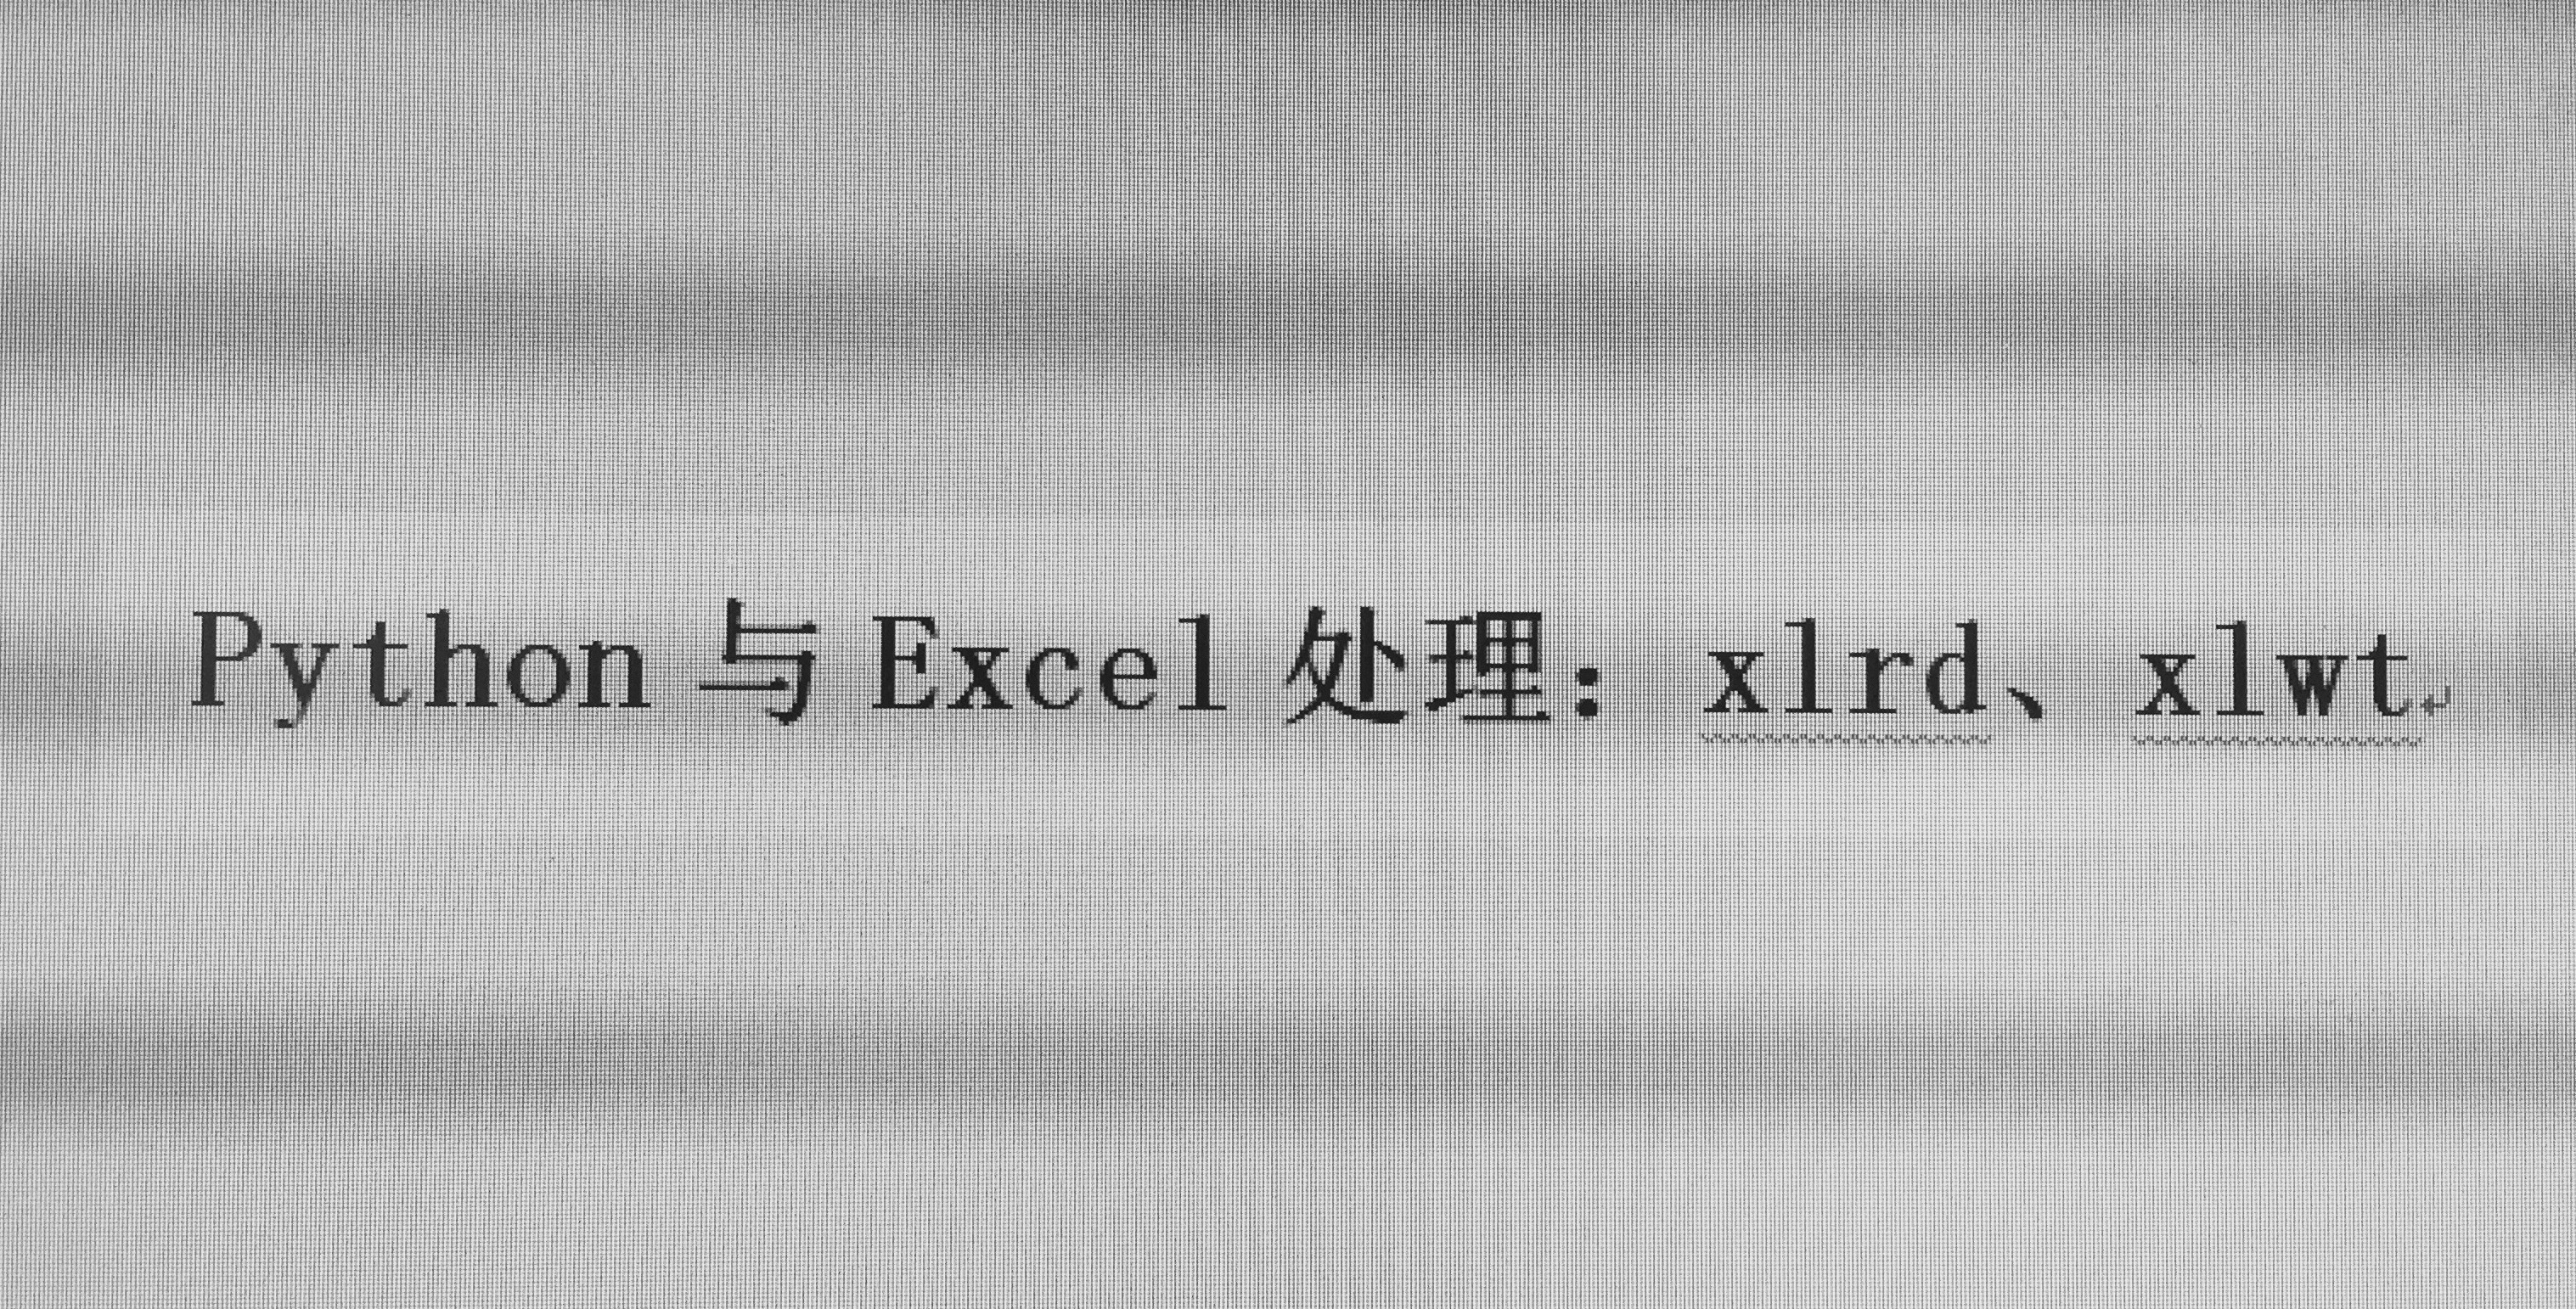 Python与Excel处理:xlrd、xlwt - 知乎